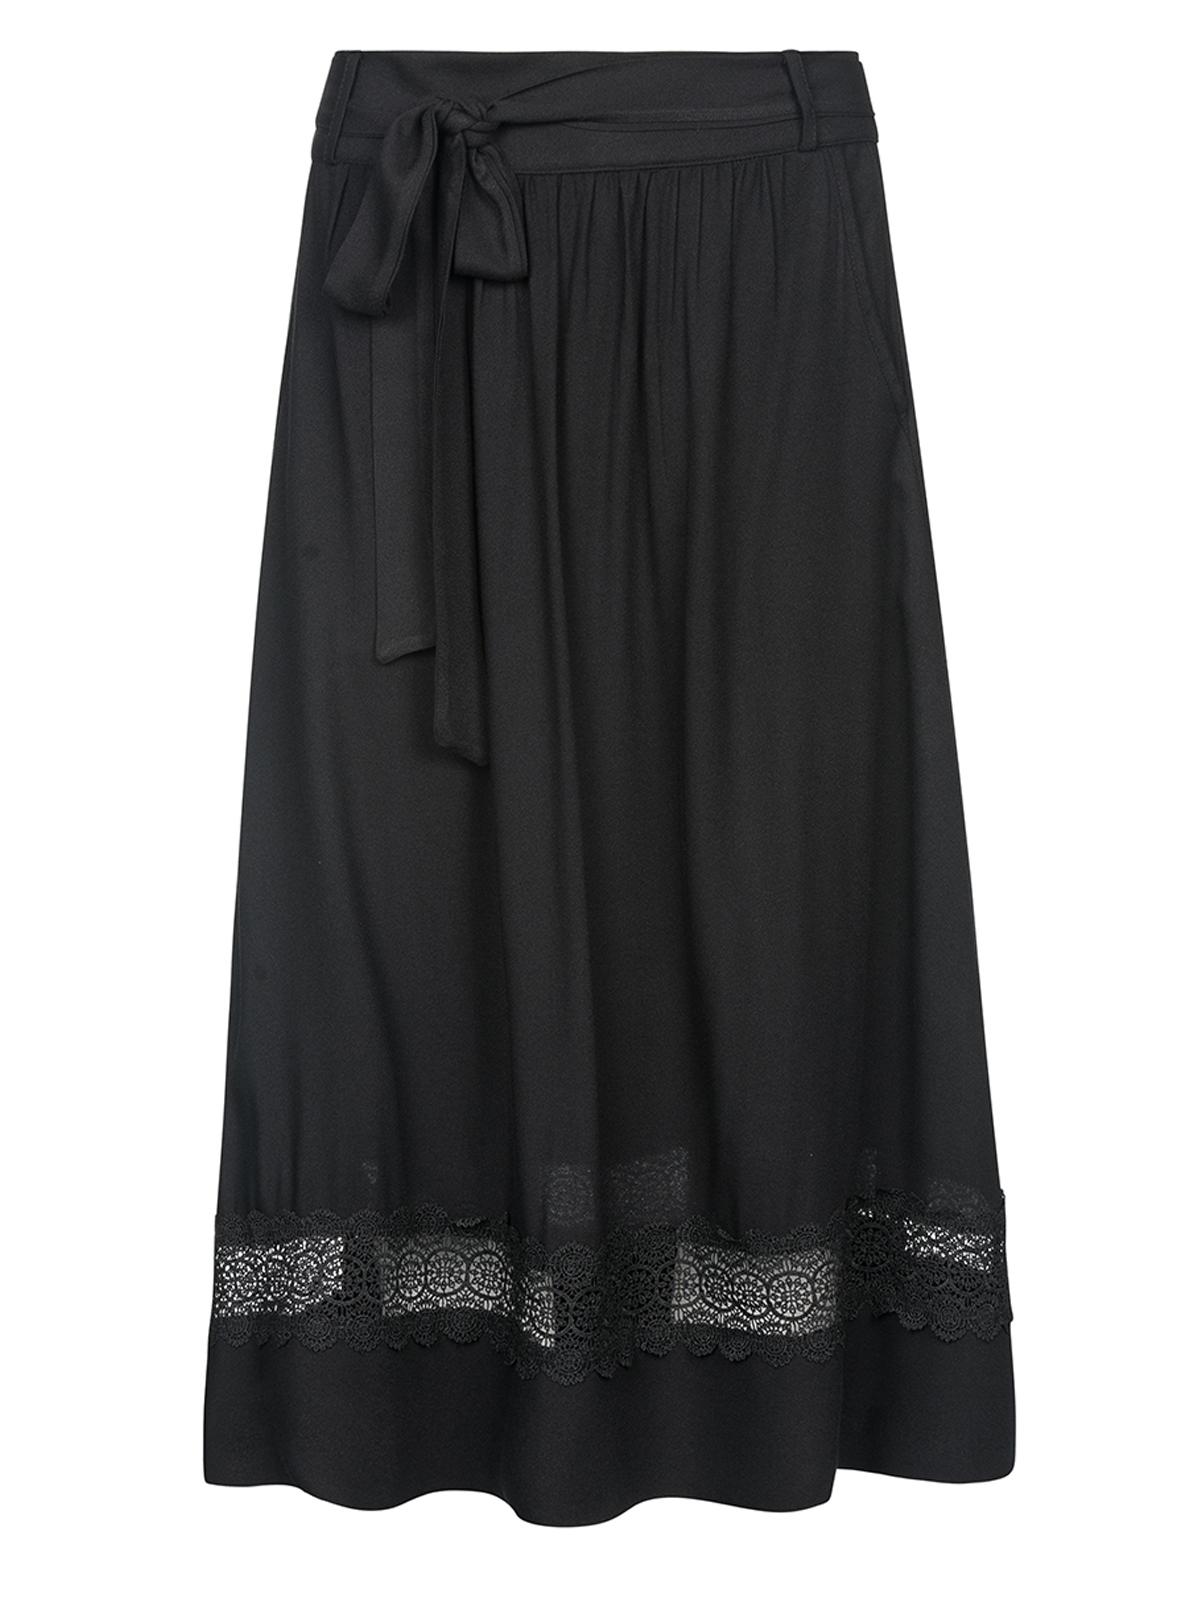 Roecke - Vive Maria Mon Vintage Skirt black – Größe S  - Onlineshop NAPO Shop